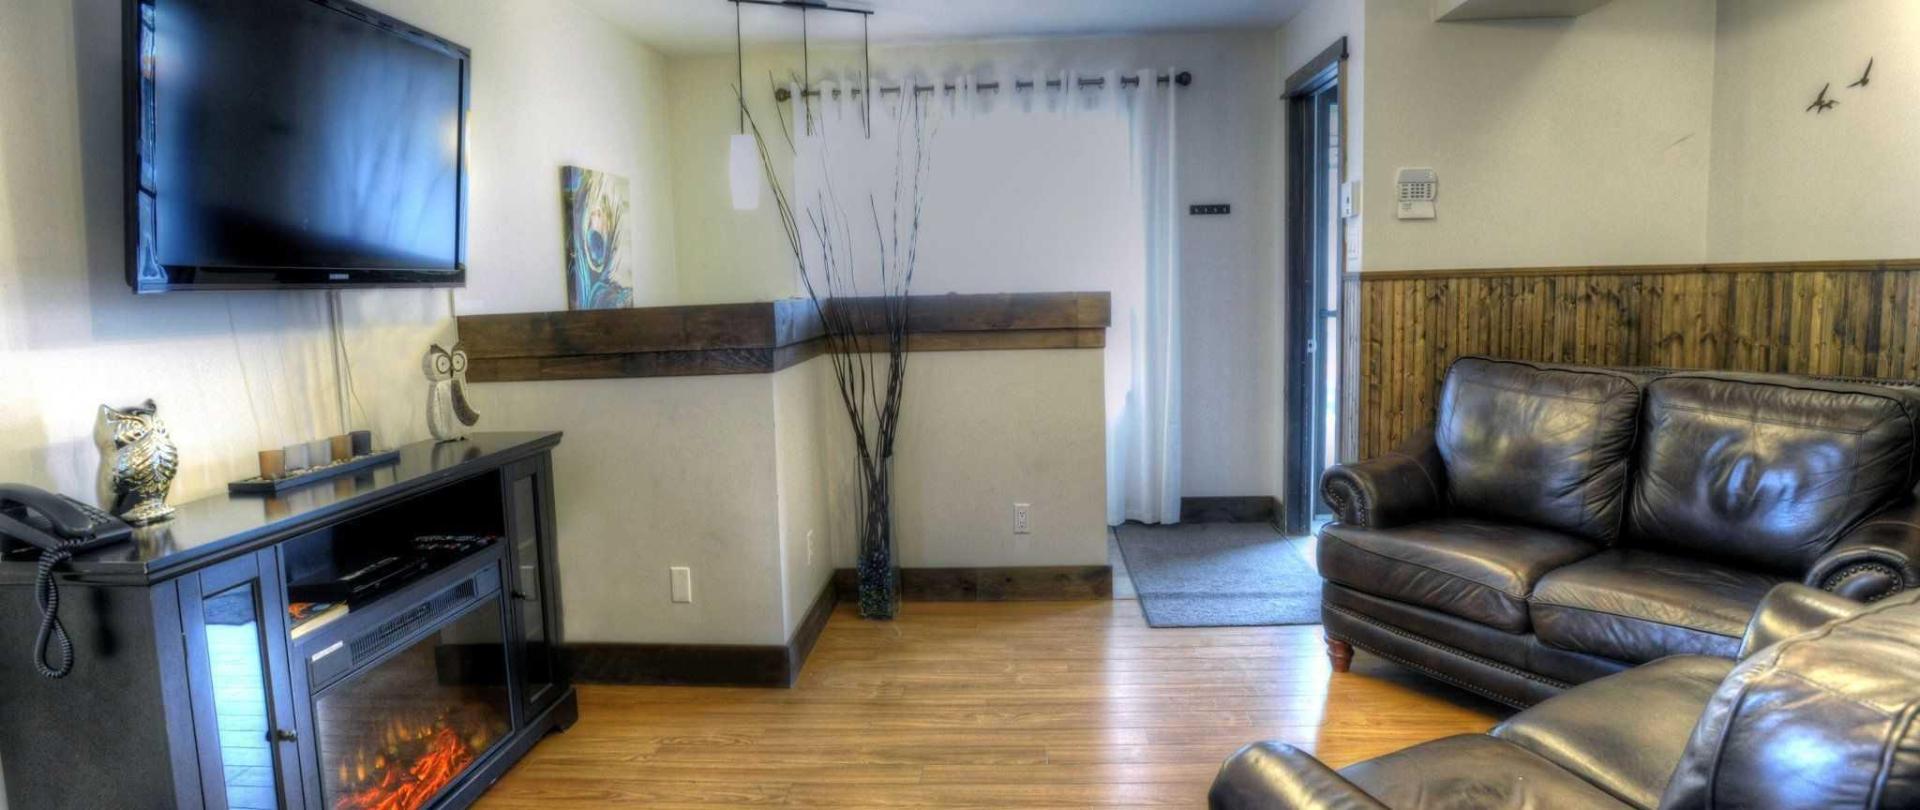 continental-3-salon-suite-1.jpg